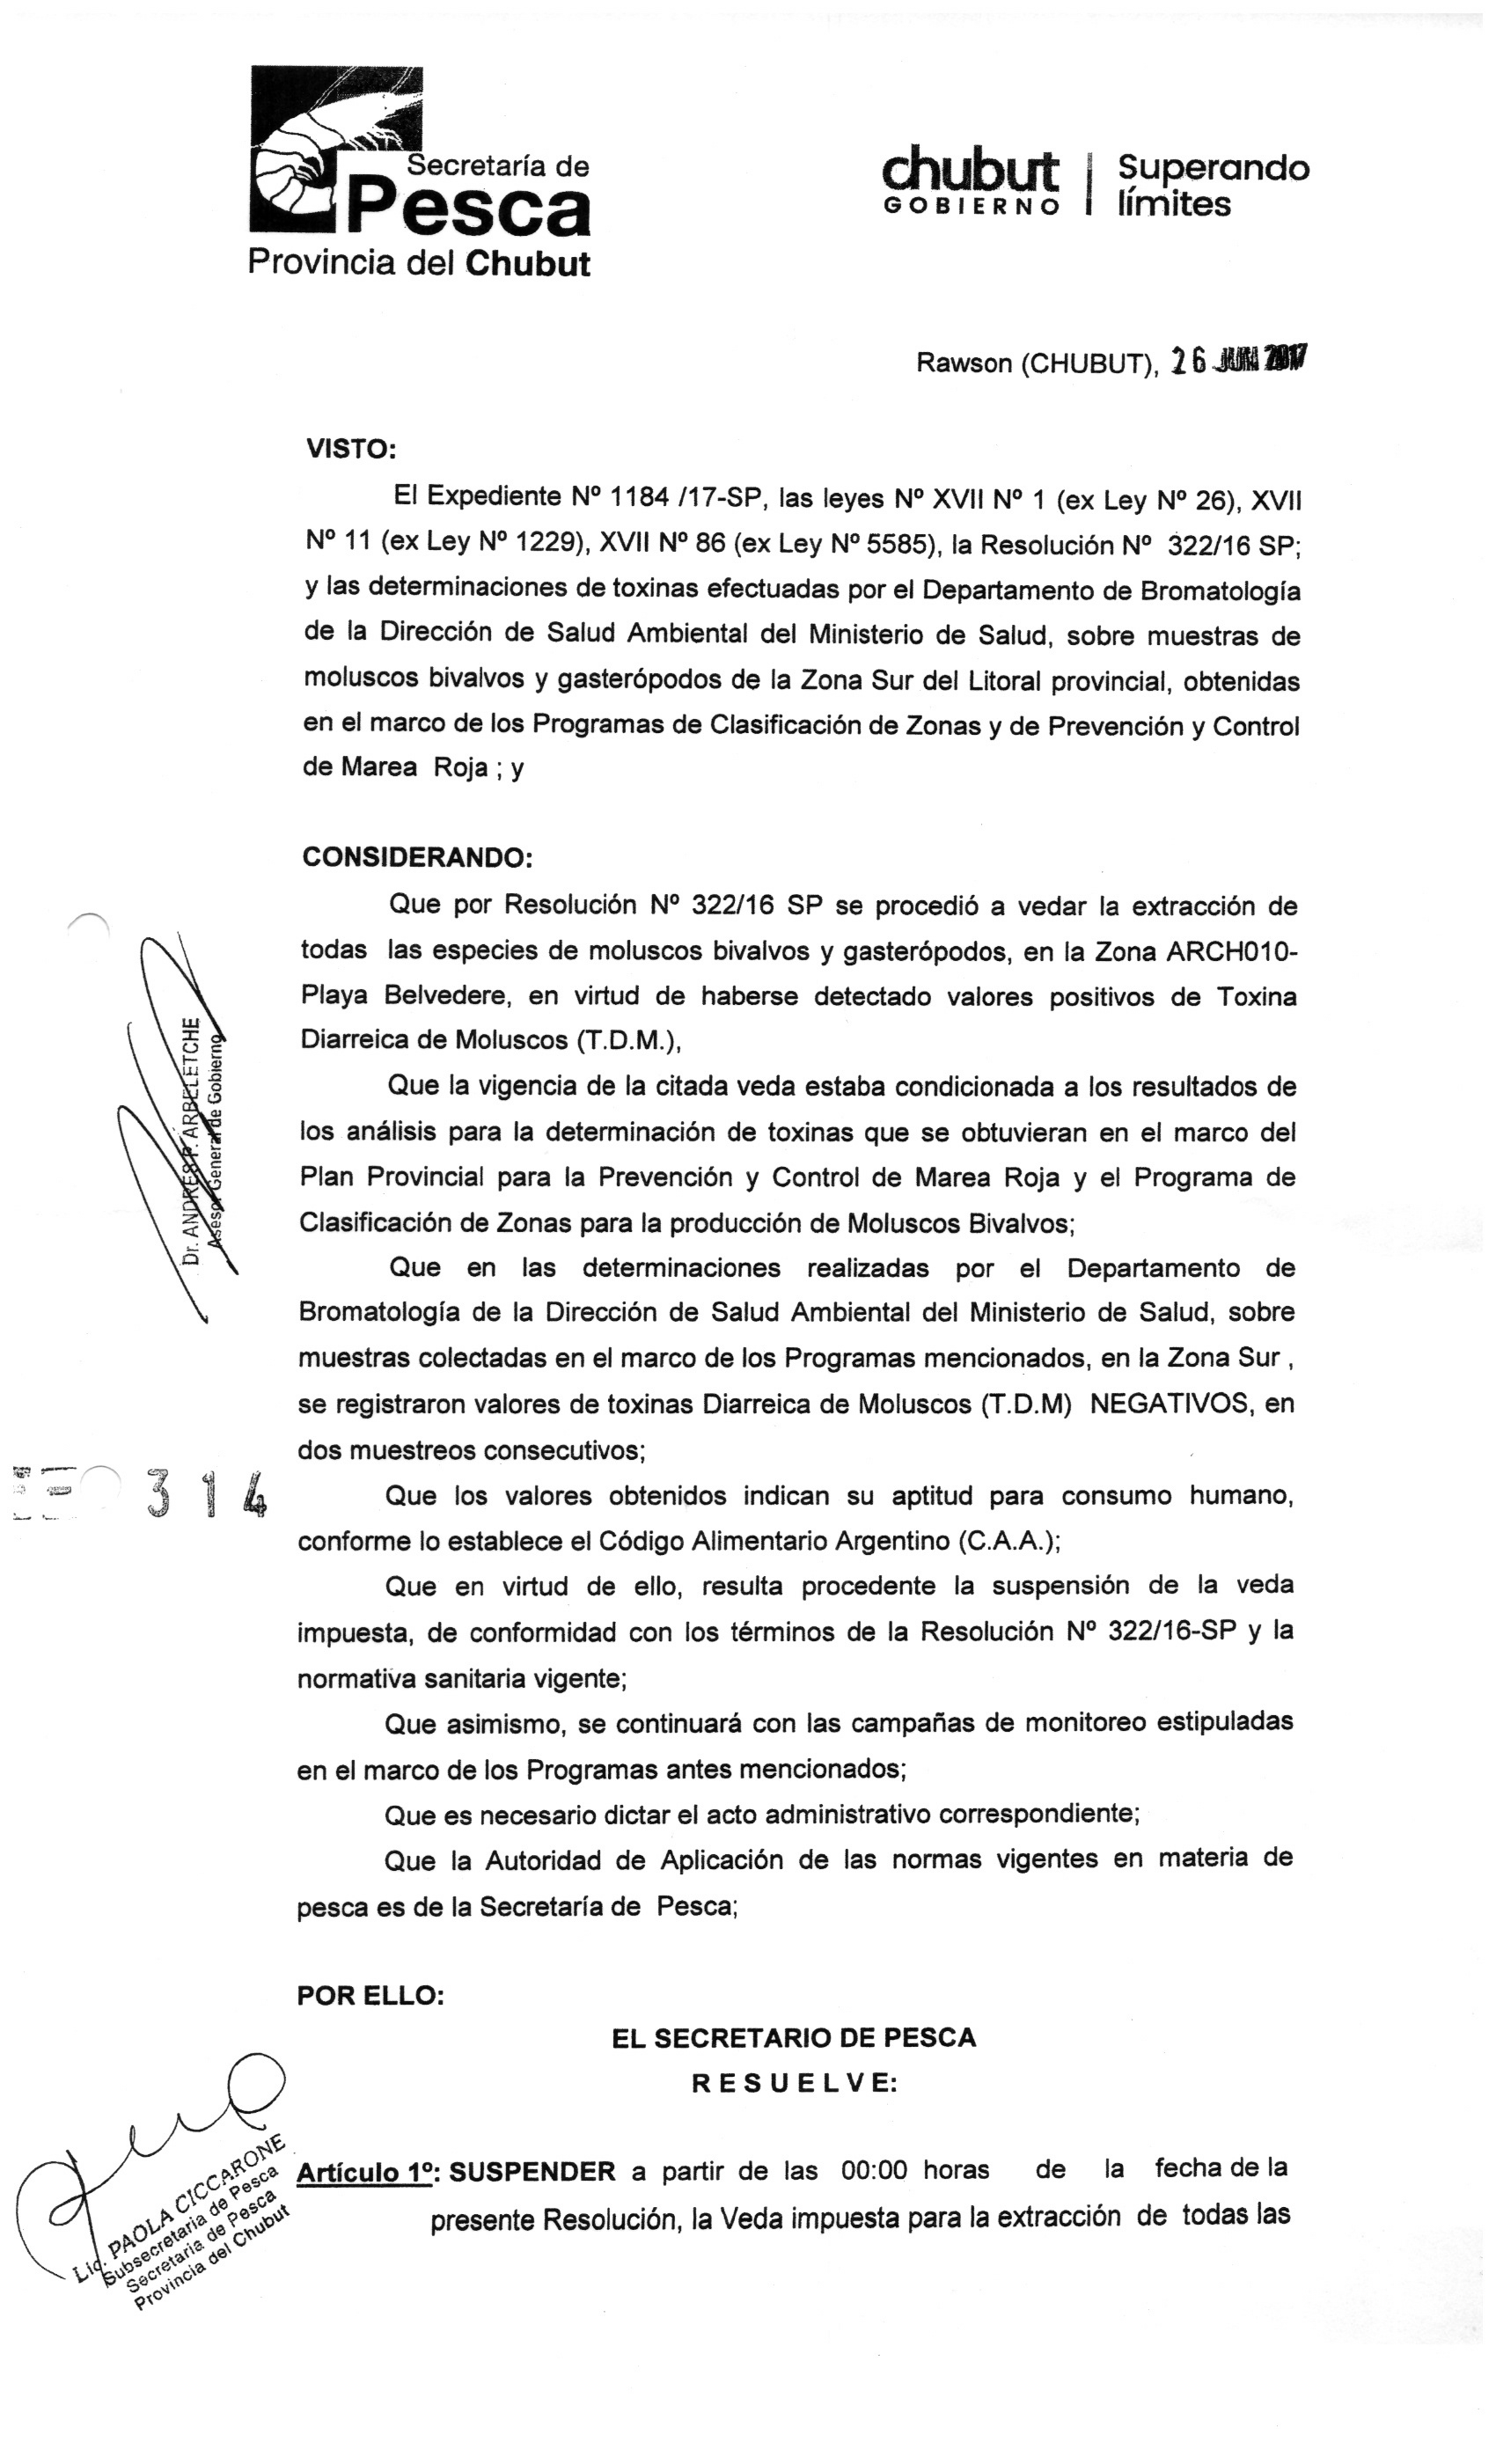 resolucion 314 - 1